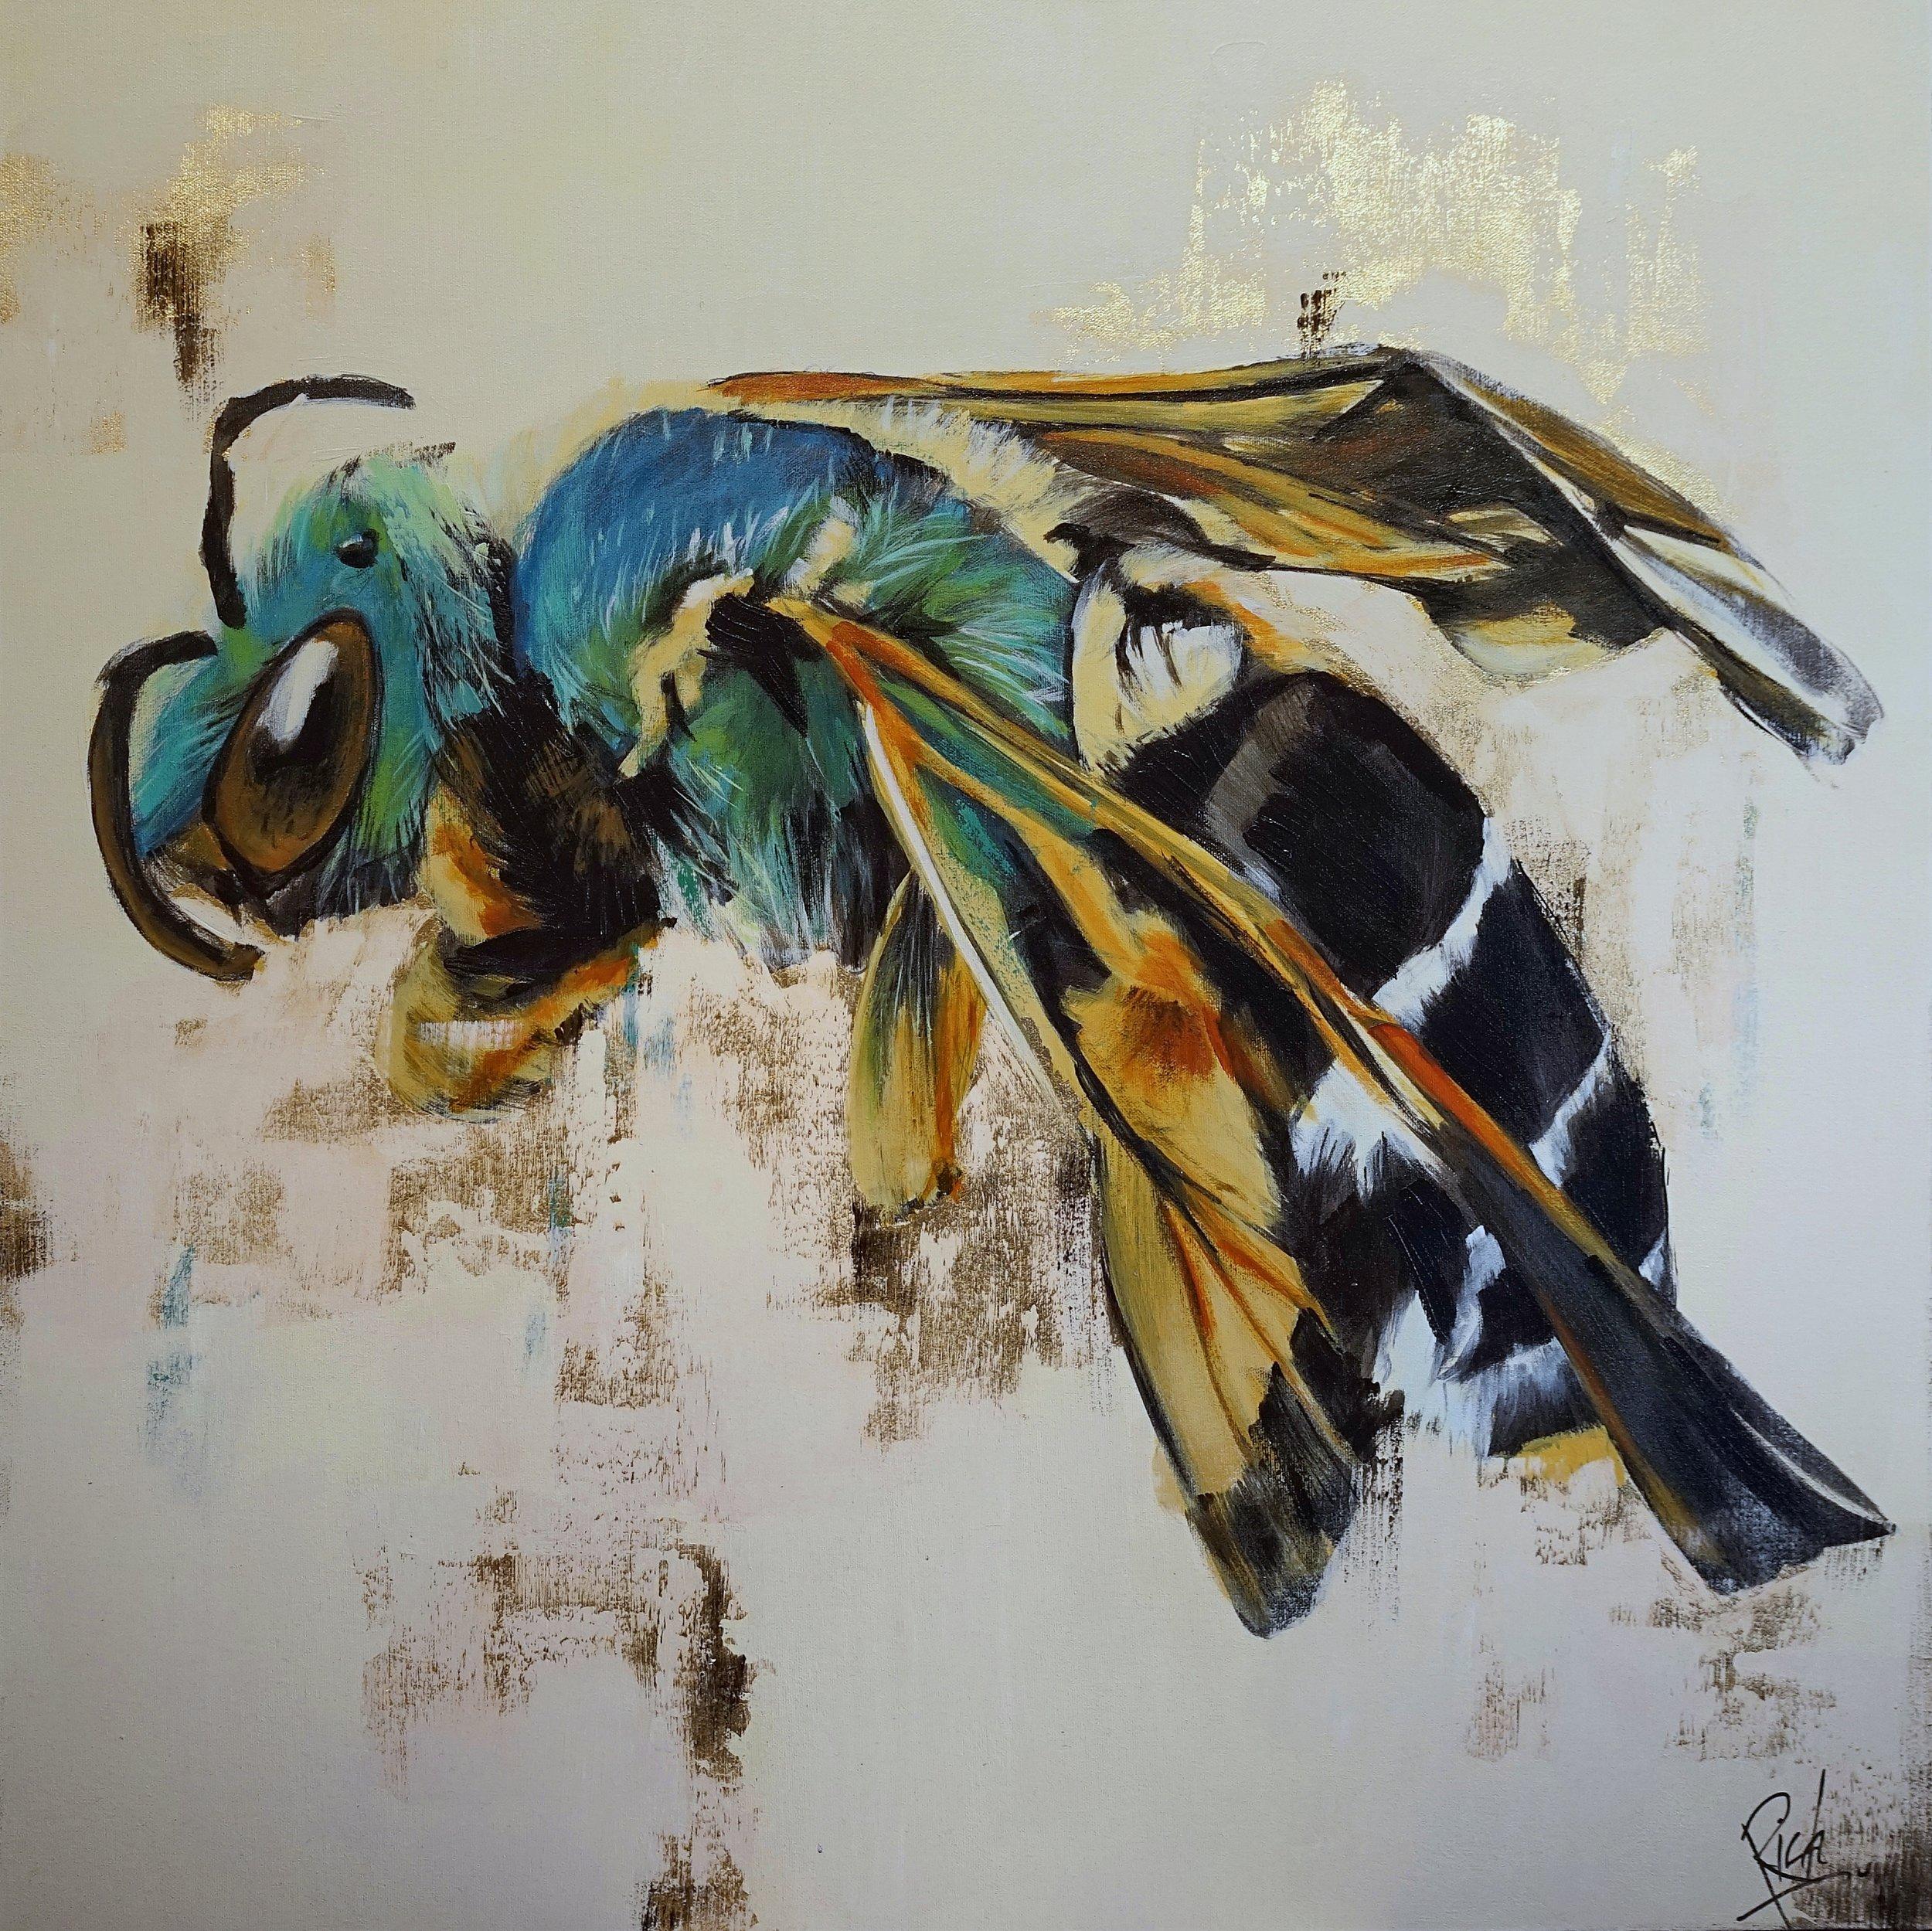 Acrylic with silver leaf on canvas 30x30